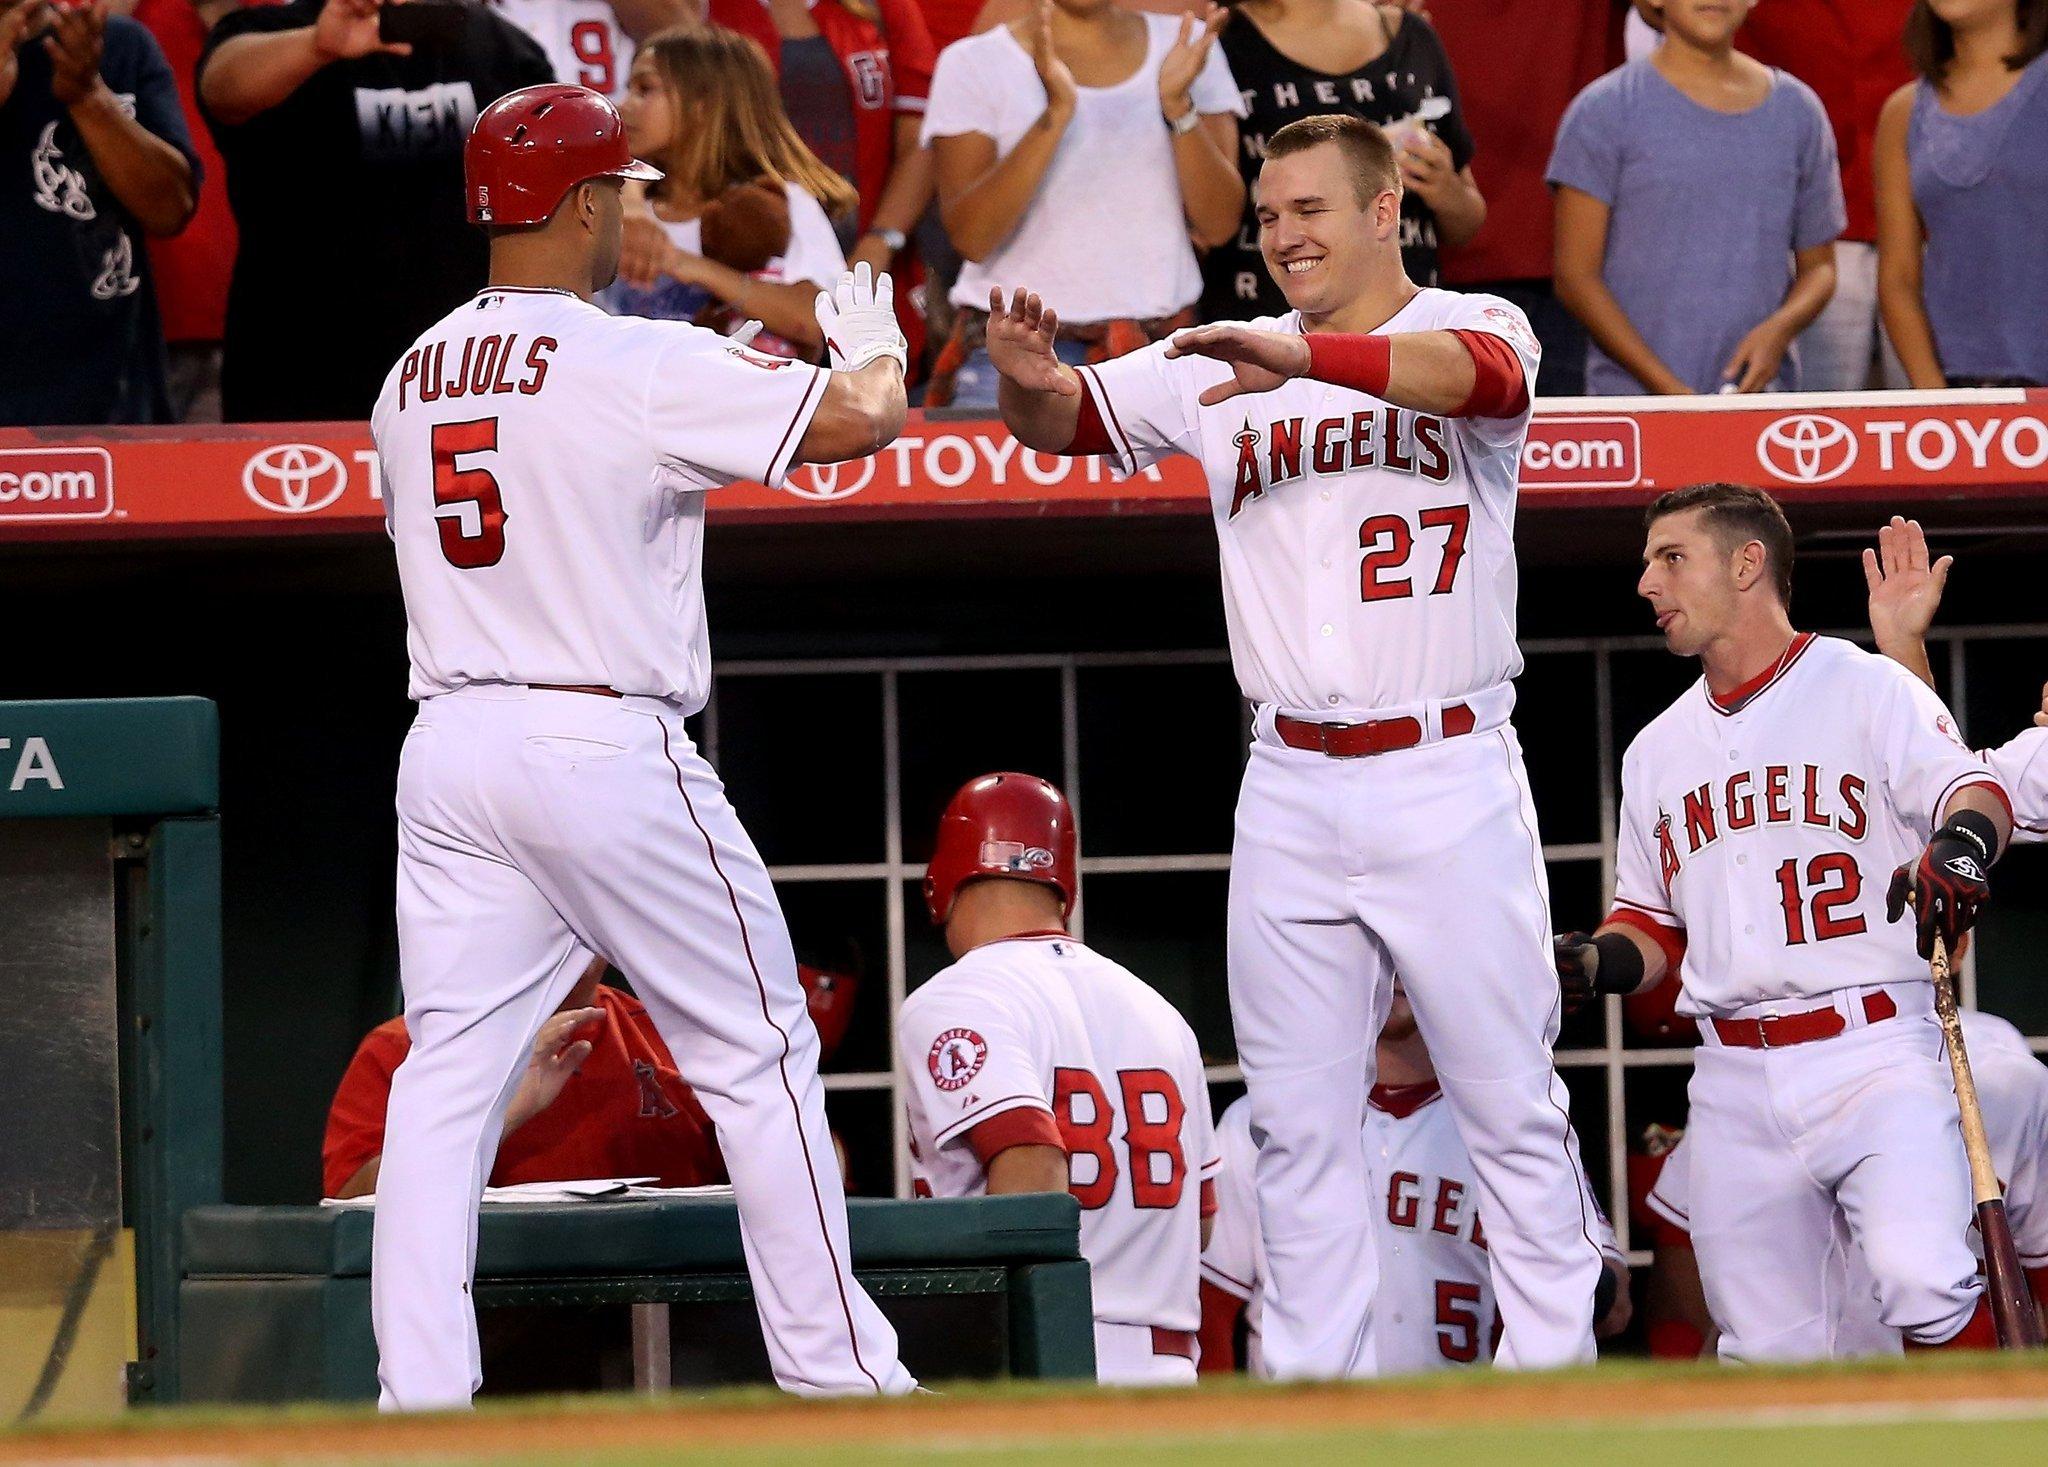 Carlos Rodon sharp, but White Sox fall to Angels